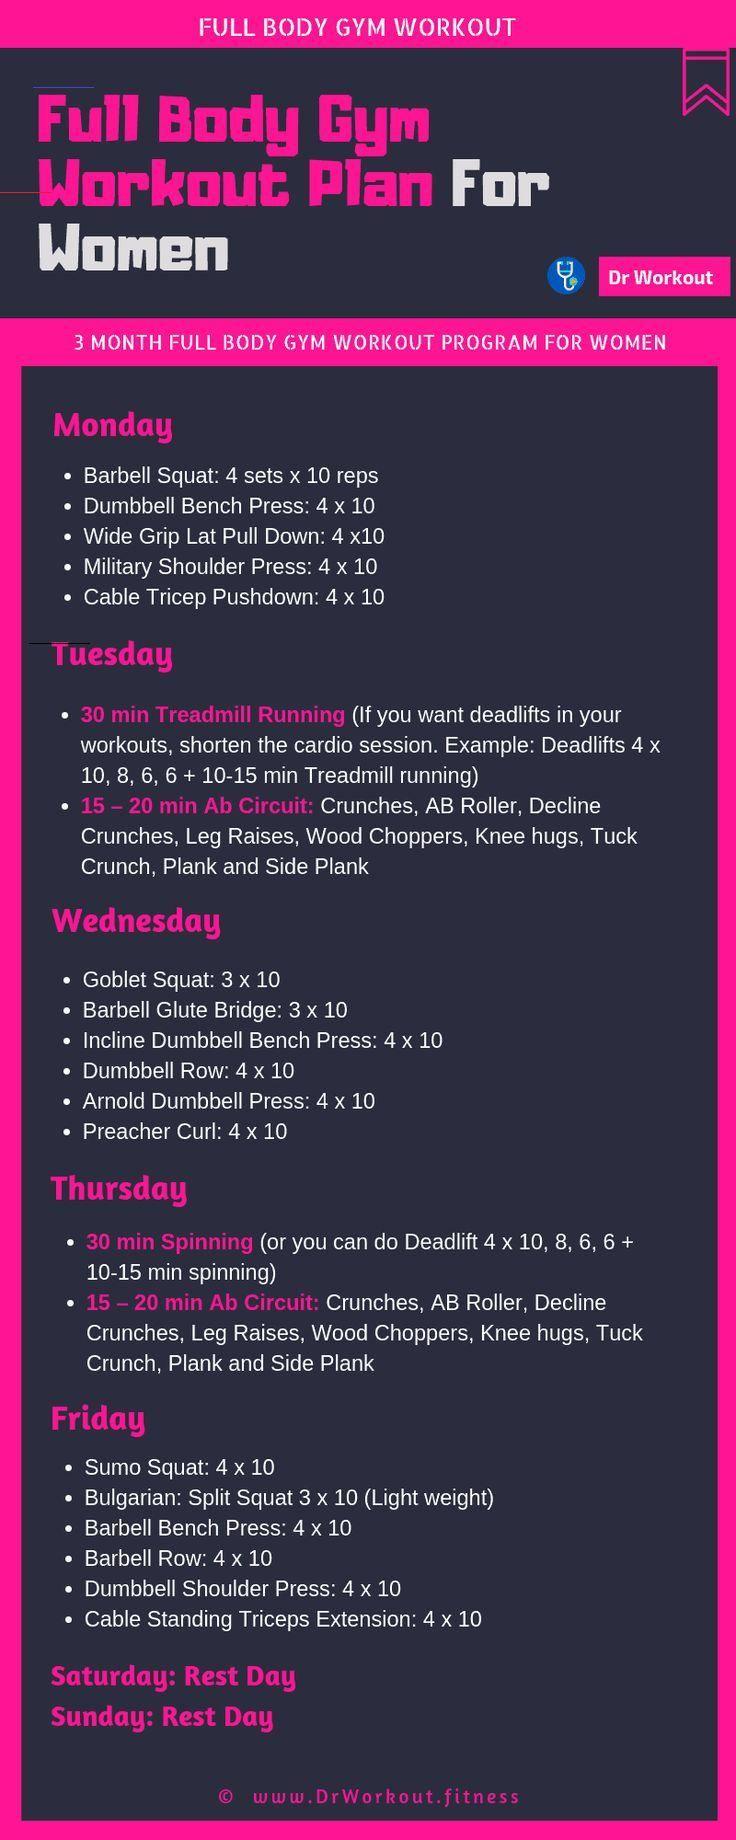 Full Body Gym Workout Plan For Women #fullbody Full Body Gym Workout Plan For Women #workout #workou...